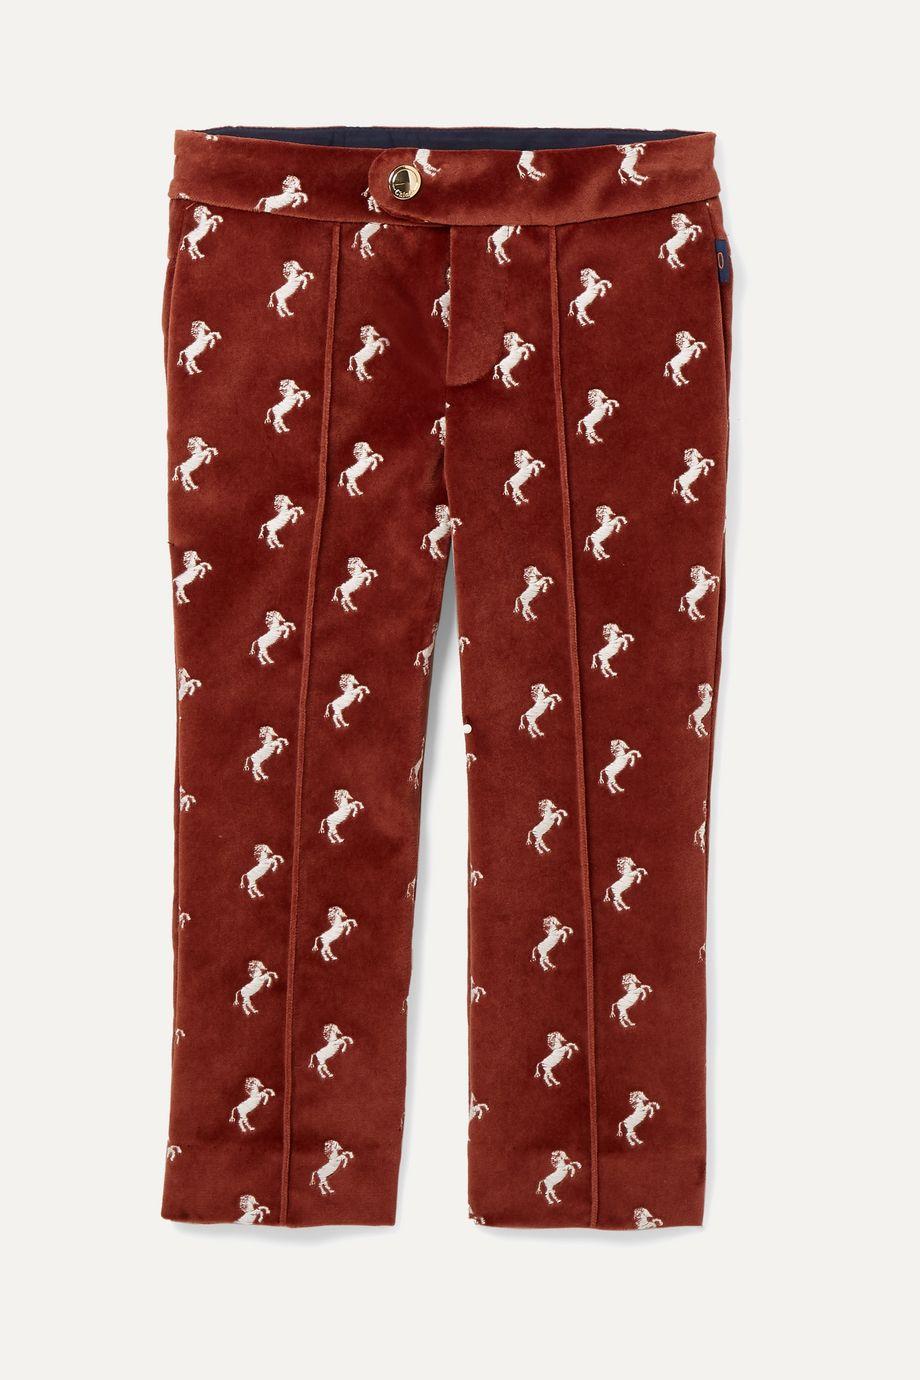 Chloé Kids Ages 2 - 5 embroidered cotton-velvet pants